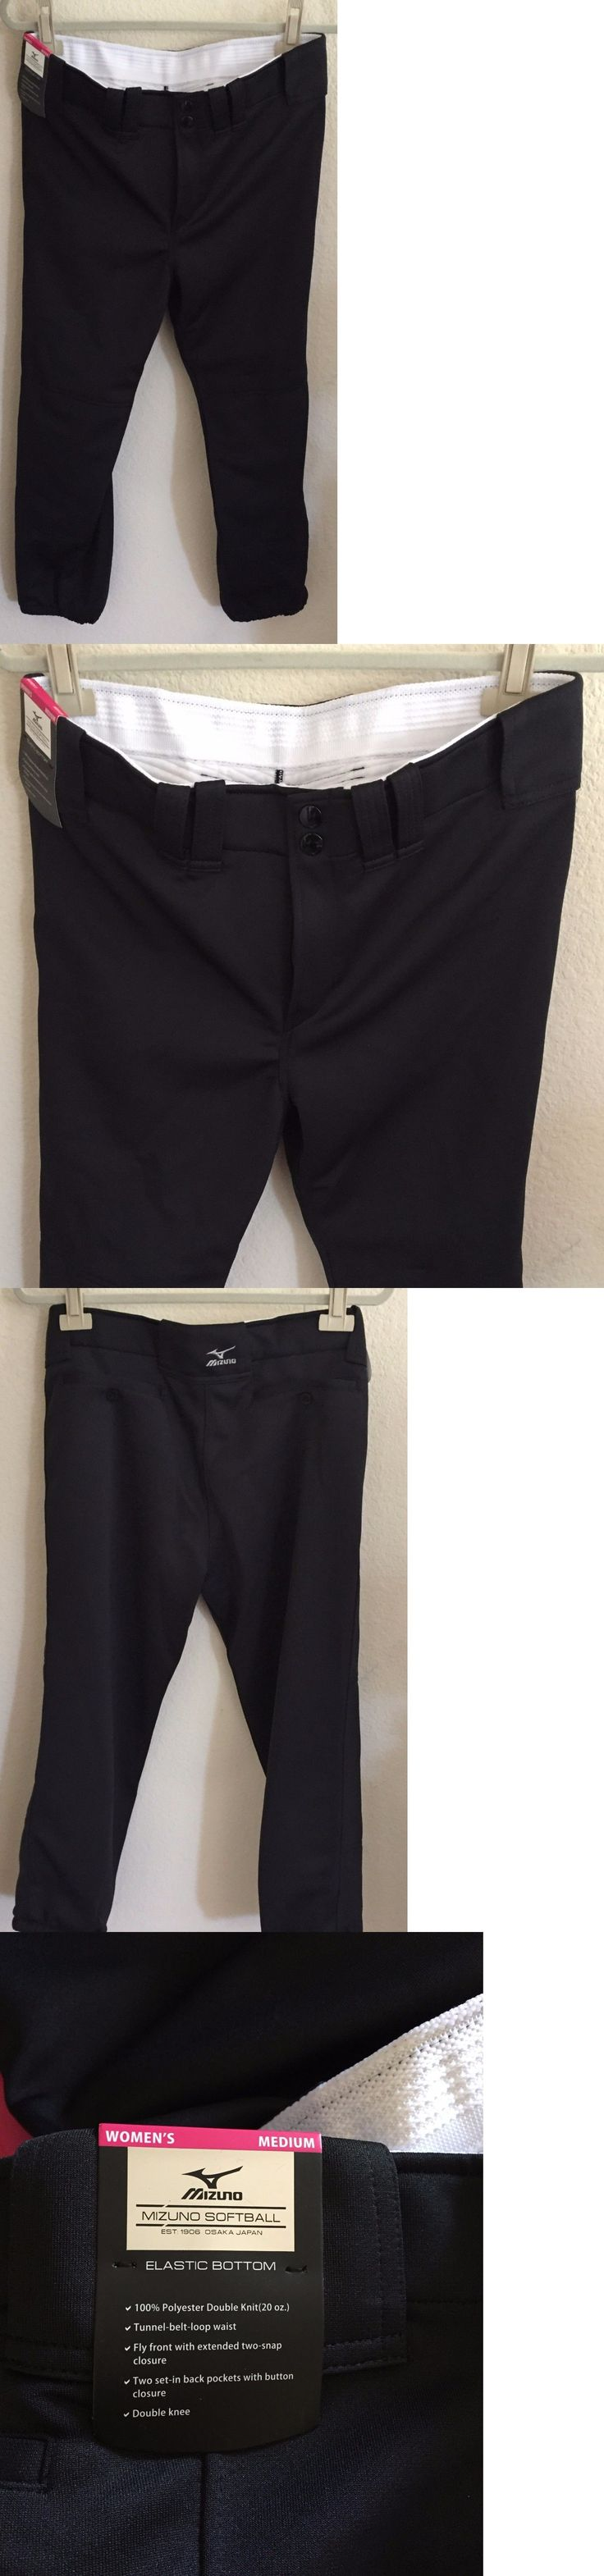 Baseball Pants 181343: Mizuno Womens Belted Softball Baseball Pants Black Medium -> BUY IT NOW ONLY: $30 on eBay!